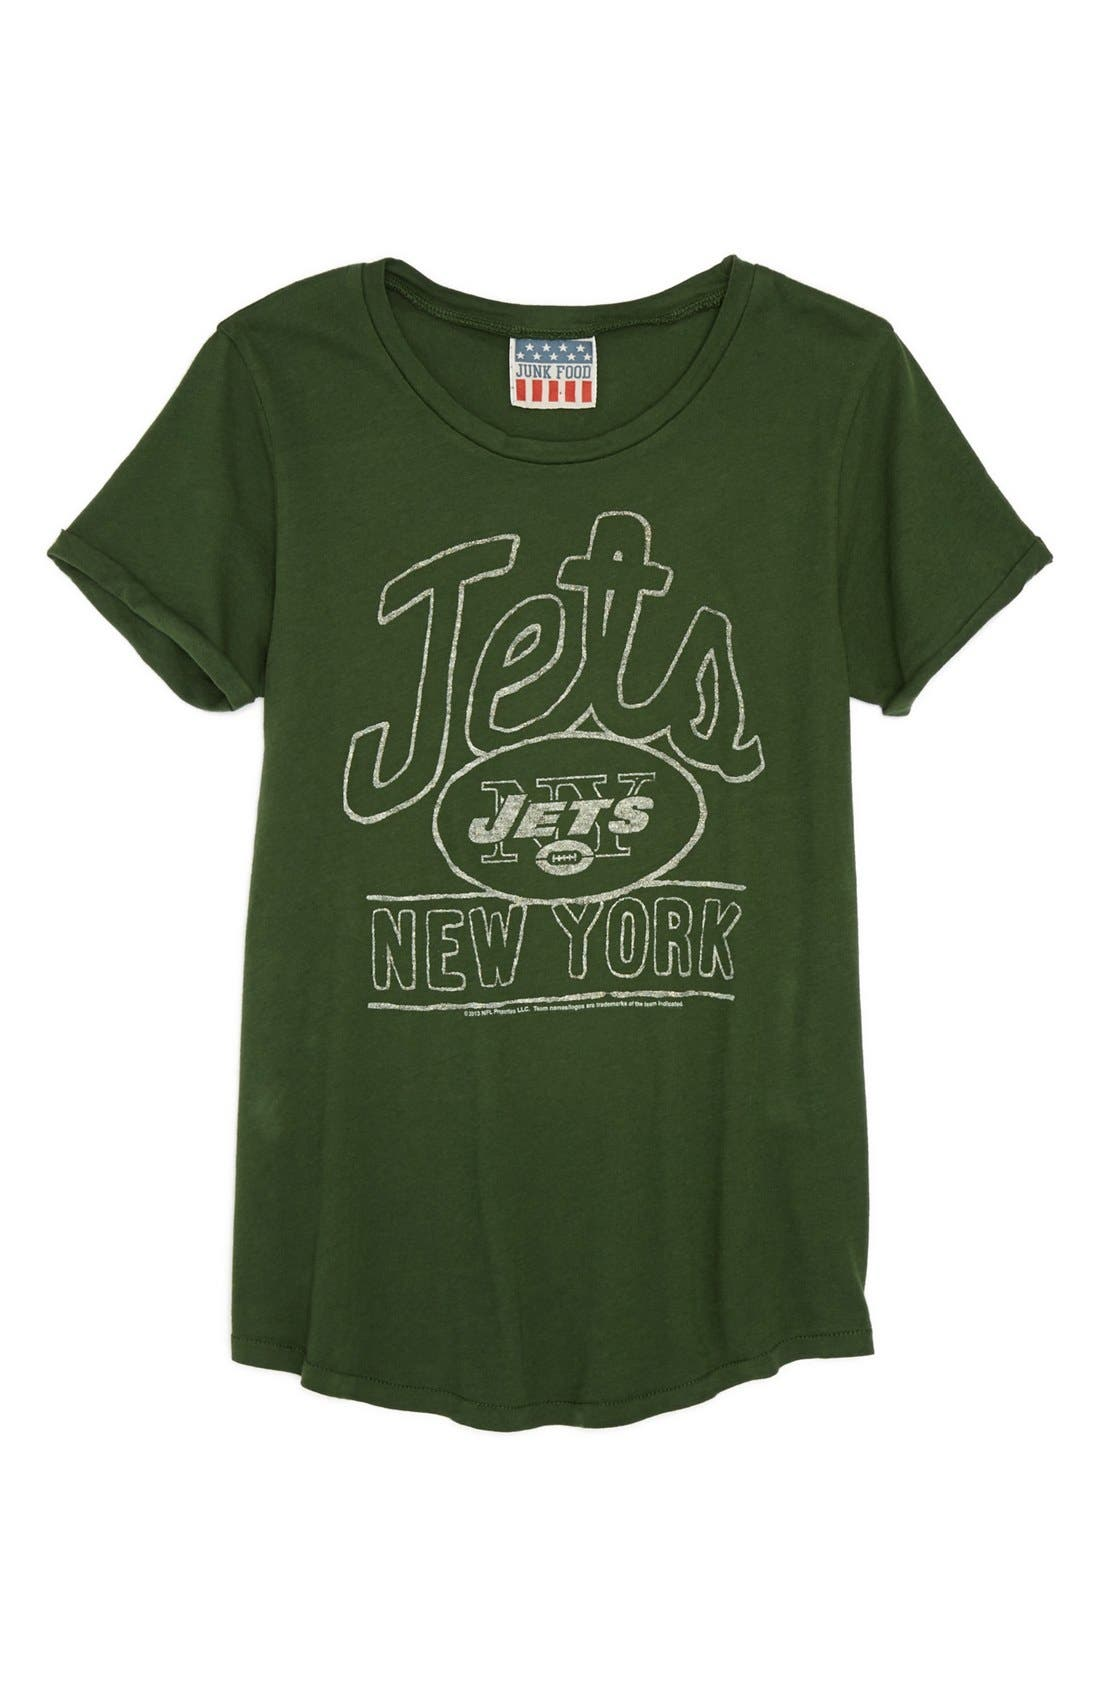 Alternate Image 1 Selected - Junk Food 'NFL - New York Jets' Tee (Big Girls)